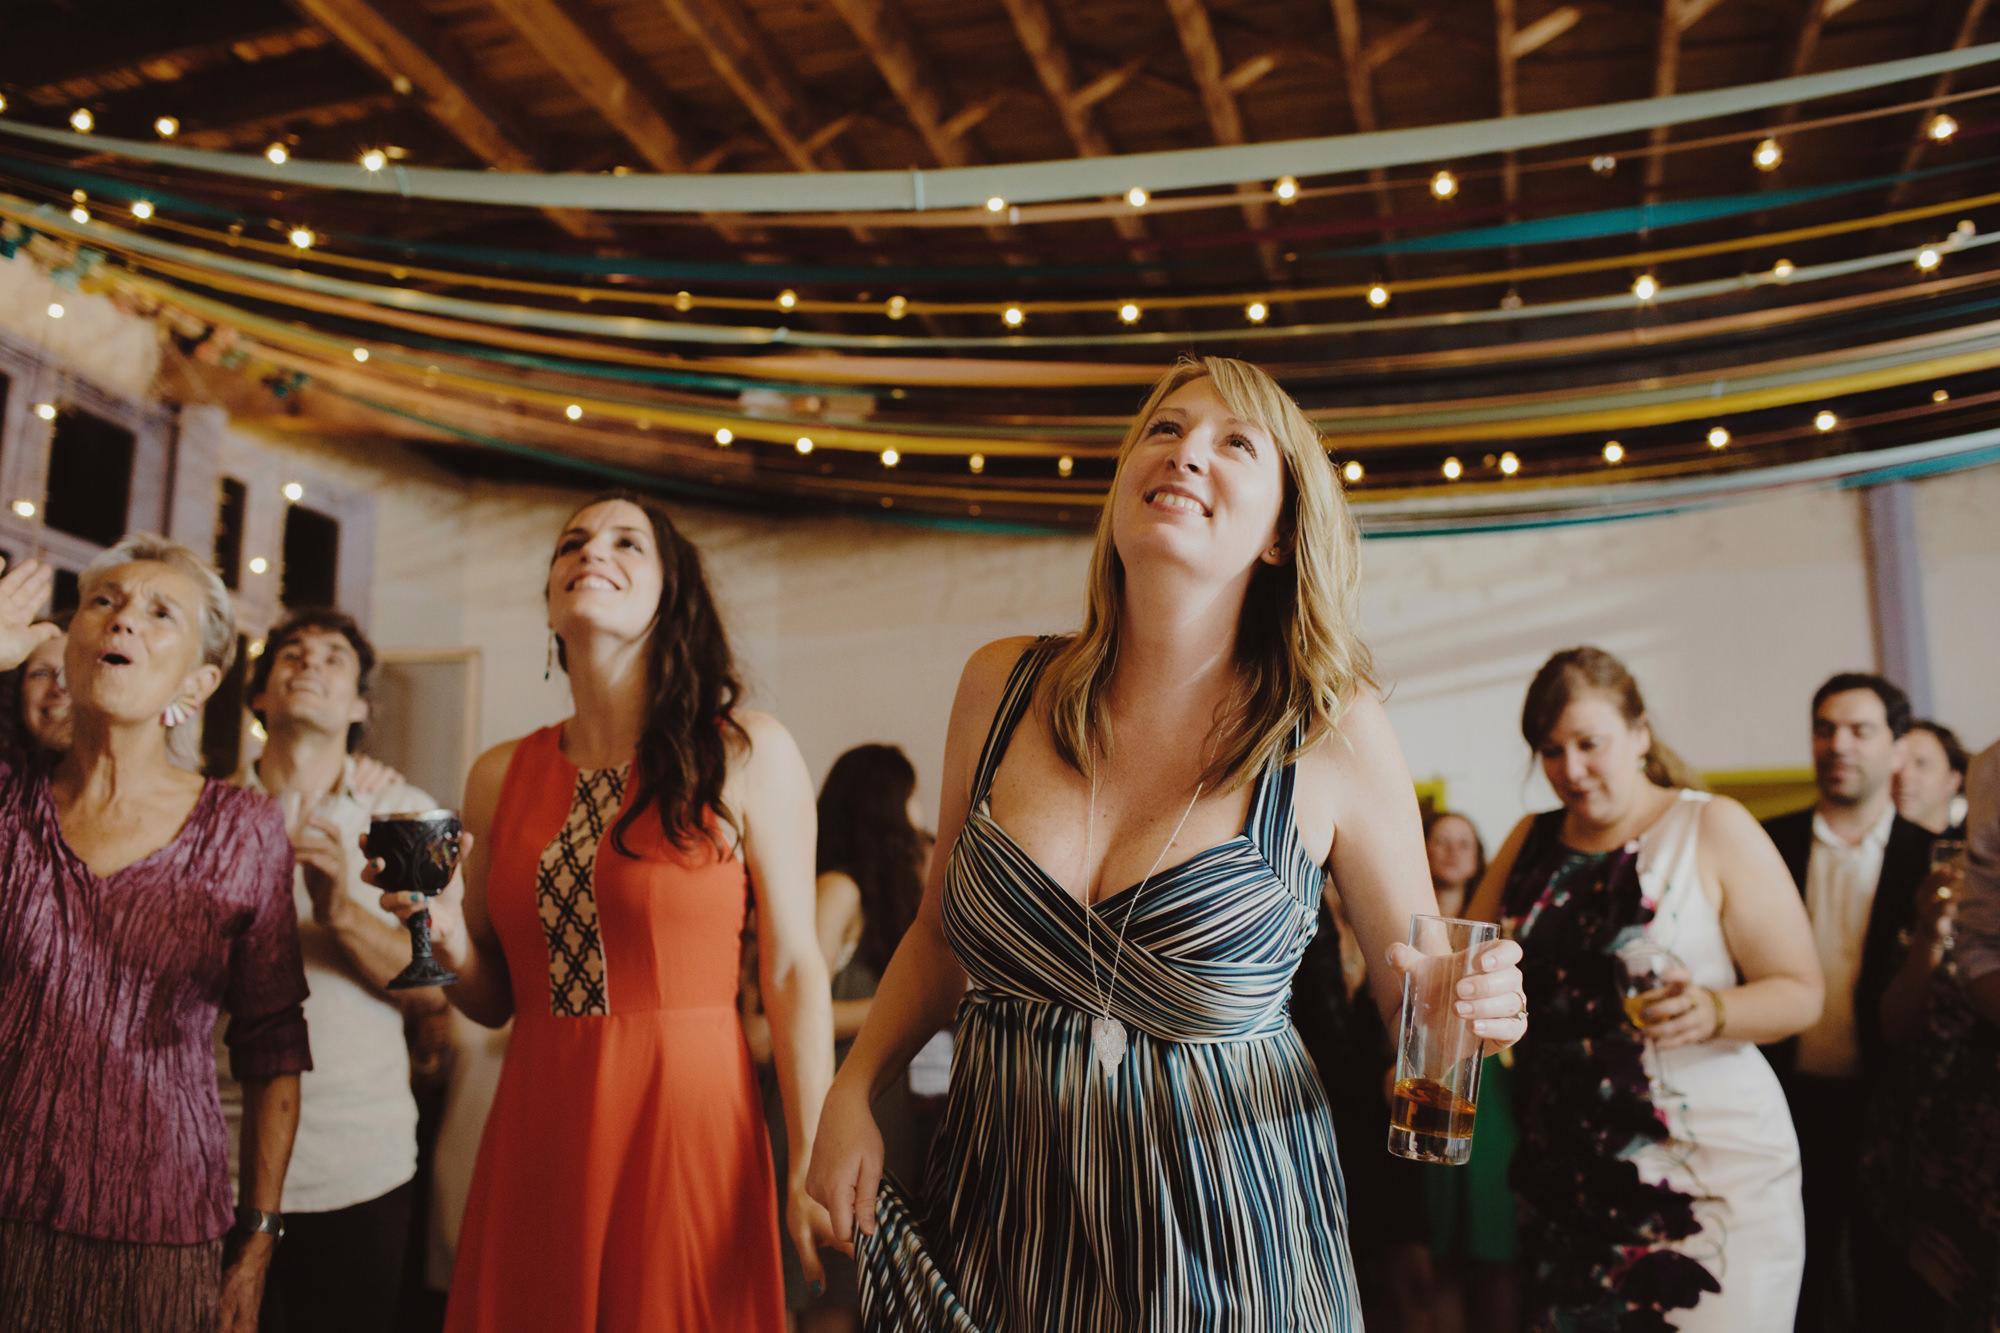 catskills_big_indian_springs_upstate_NY_wedding_sammblake141.jpg